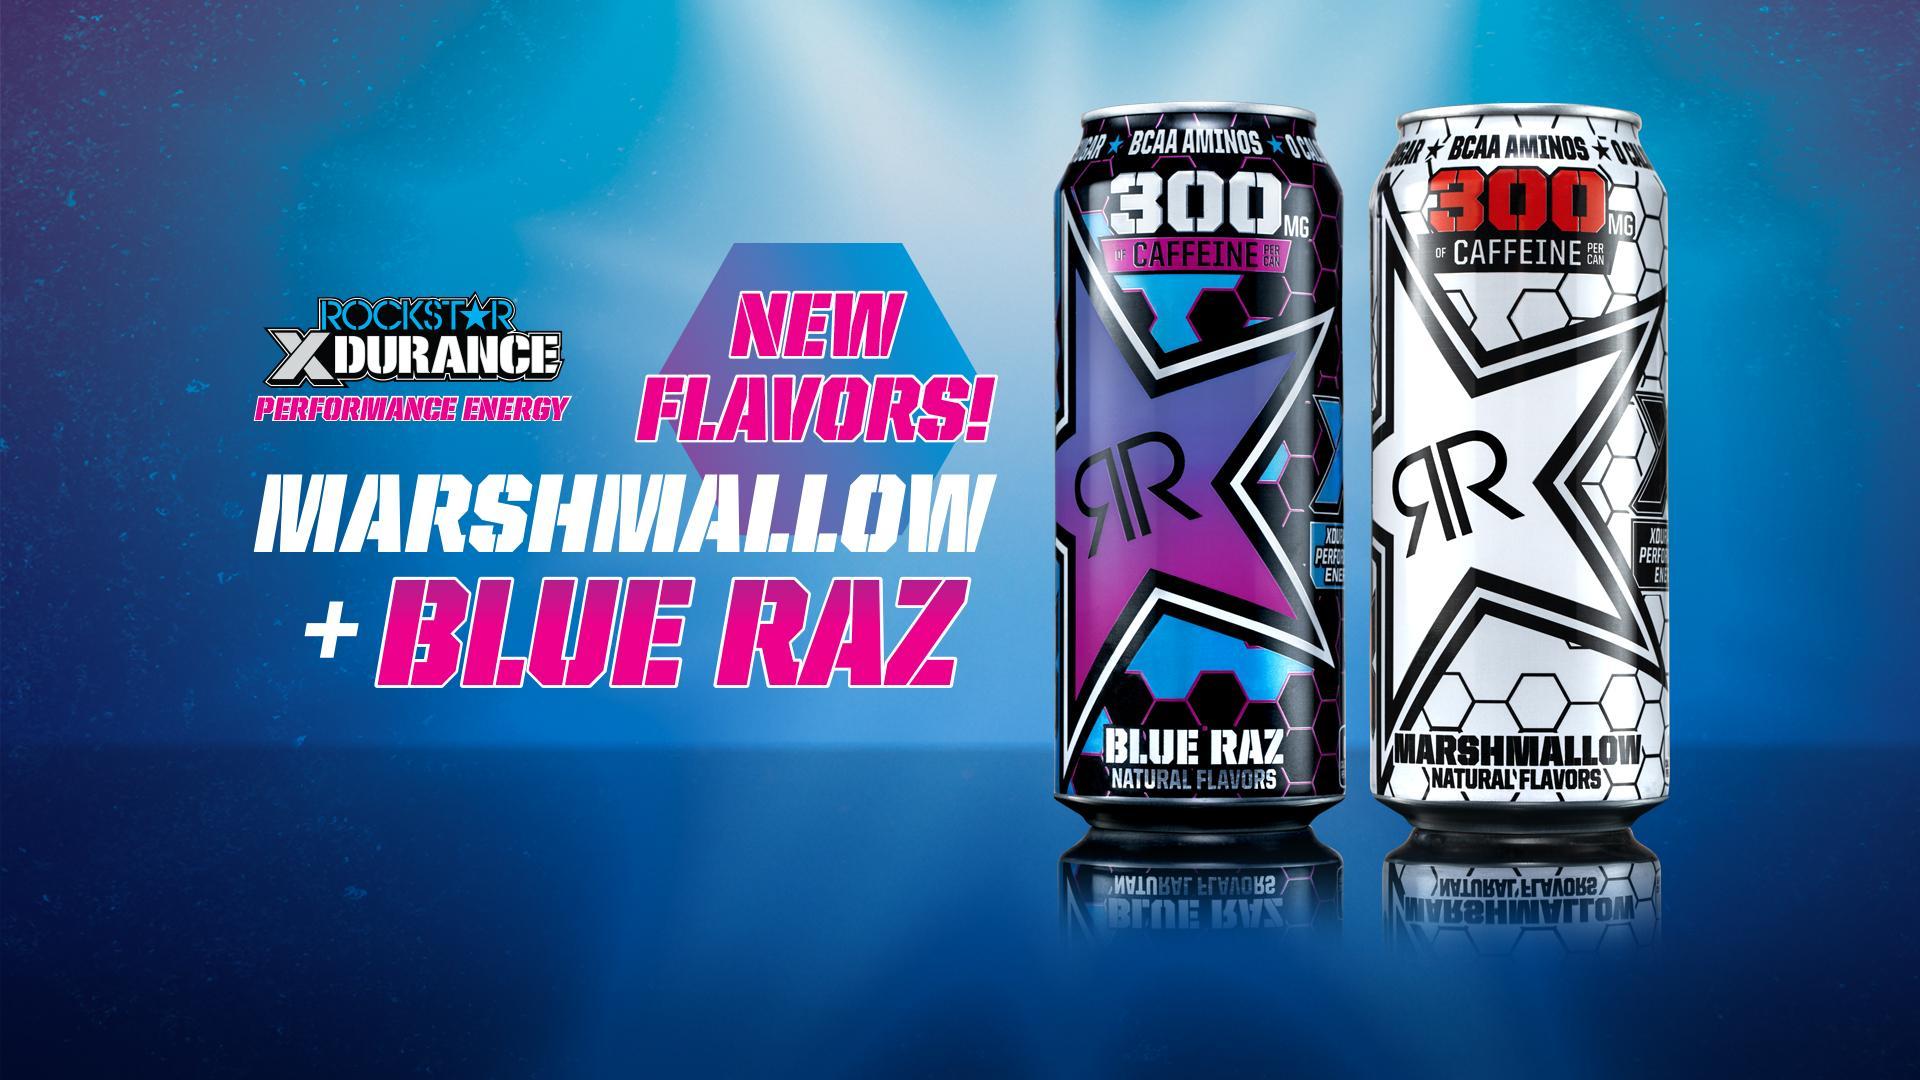 XDurance Marshmallow and Blue Raz